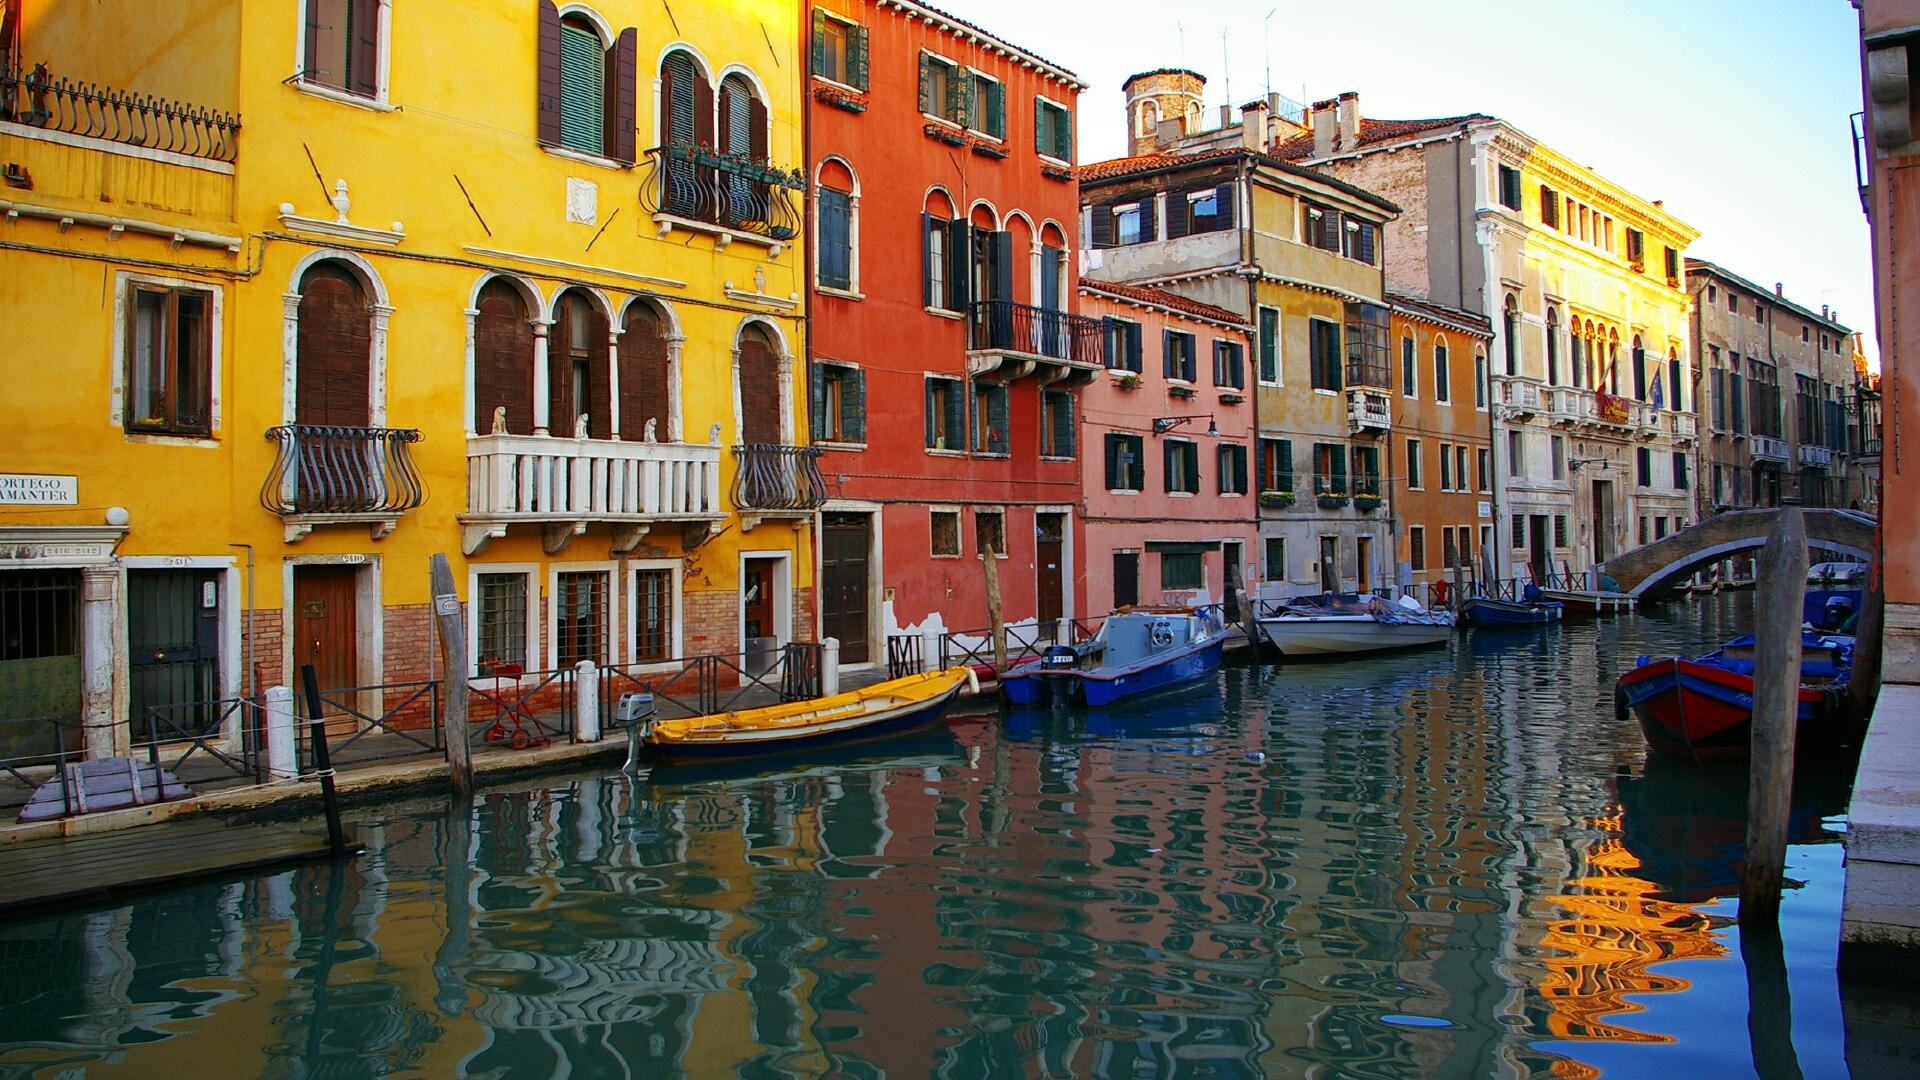 Download Buildings Venice Wallpaper 1920x1080 | Wallpoper #370298